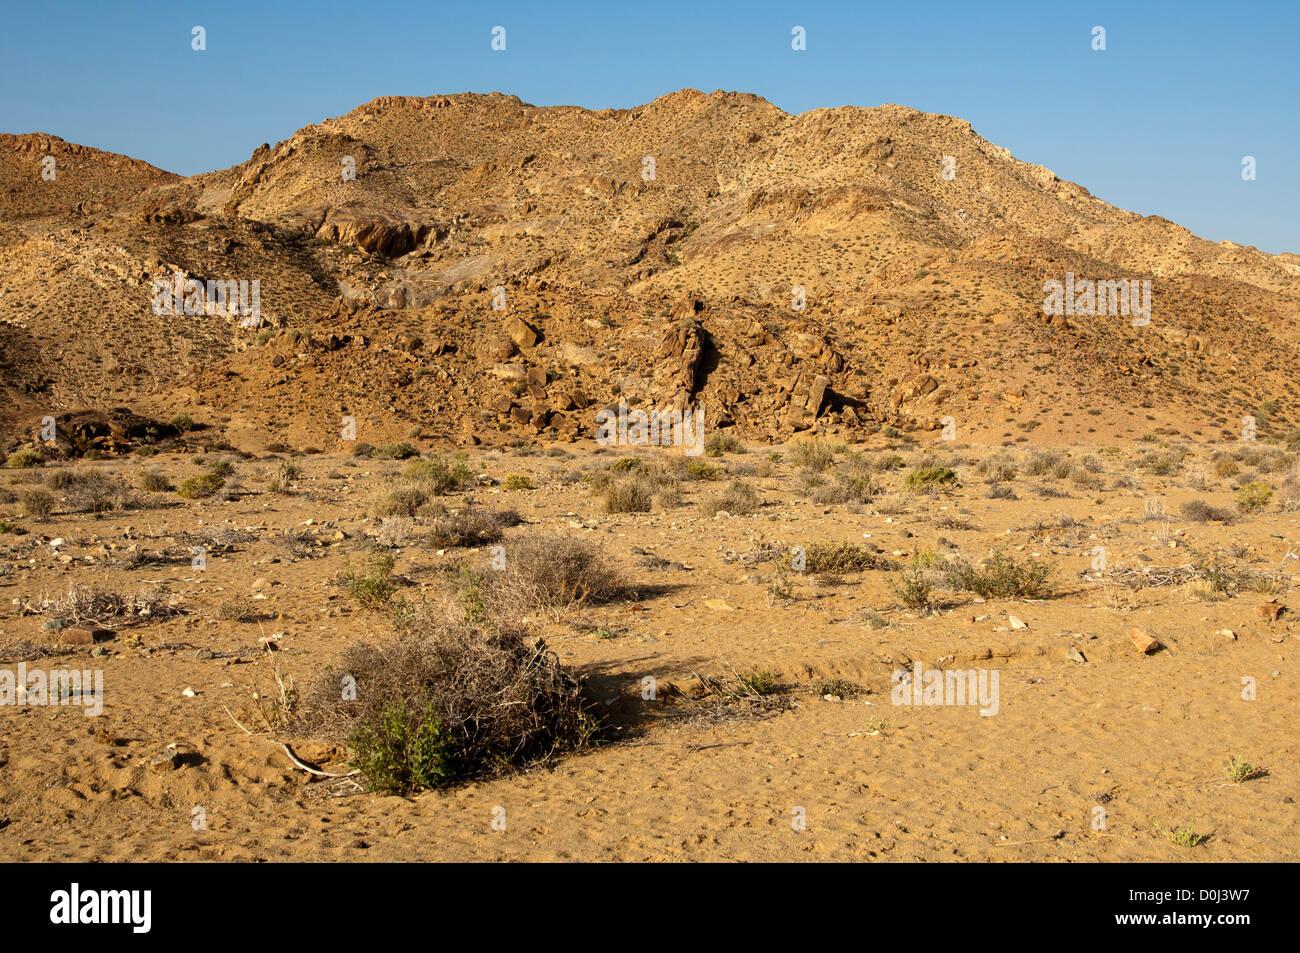 Mountainous desert landscape of the Richtersveld, Richtersveld National Park, Northern Cape, South Africa - Stock Image